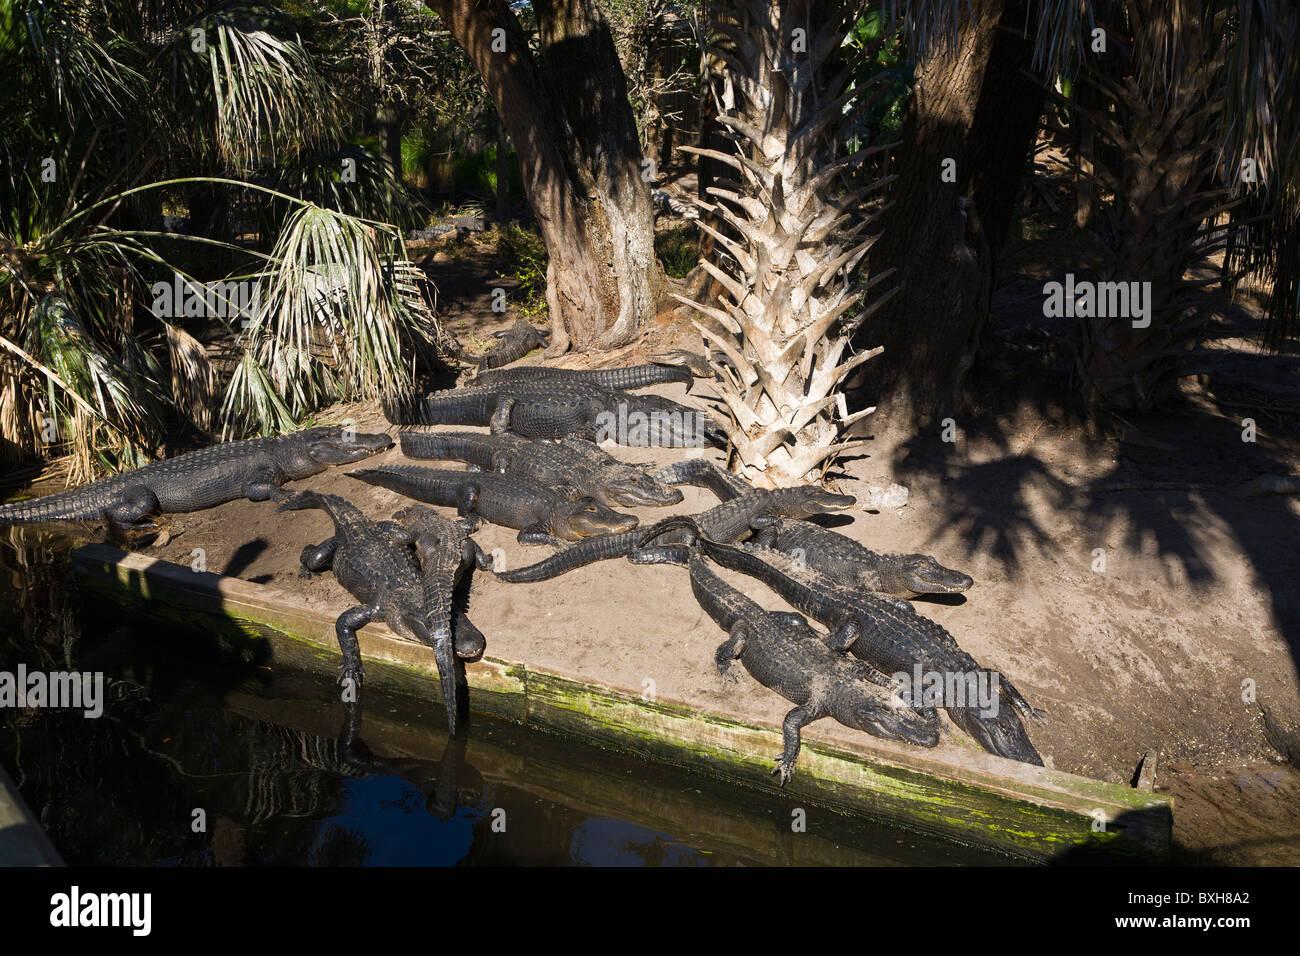 Alligators on bank at St Augustine Alligator Farm Zoological Park in St Augustine Florida - Stock Image